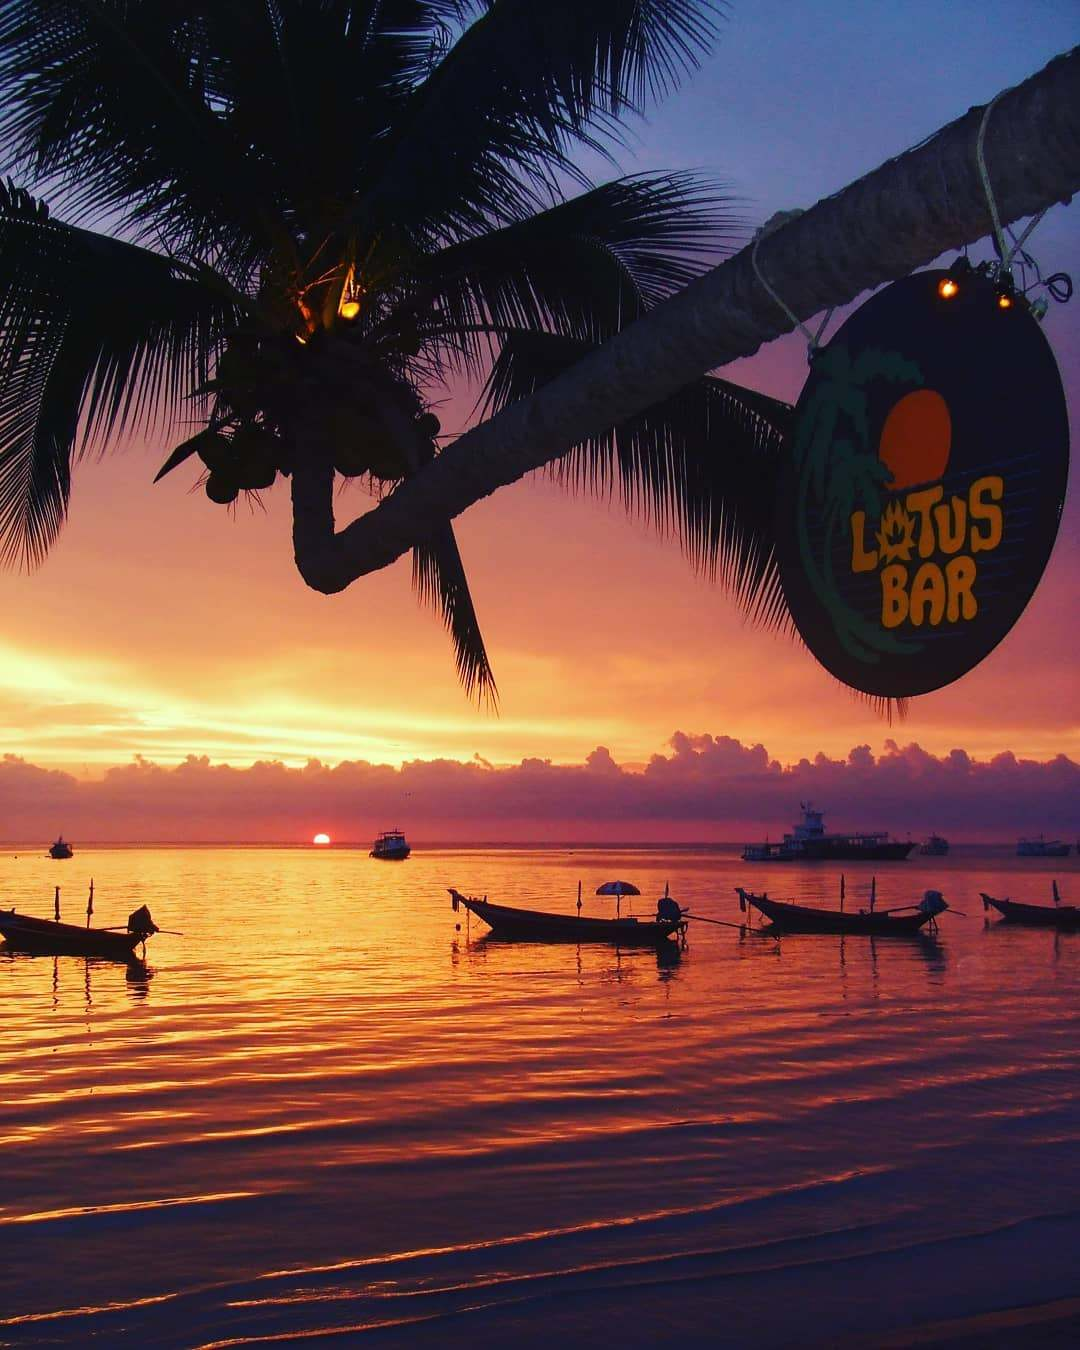 De palmboom van Lotus Bar op Sairee Beach, Koh Tao tijdens zonsondergang